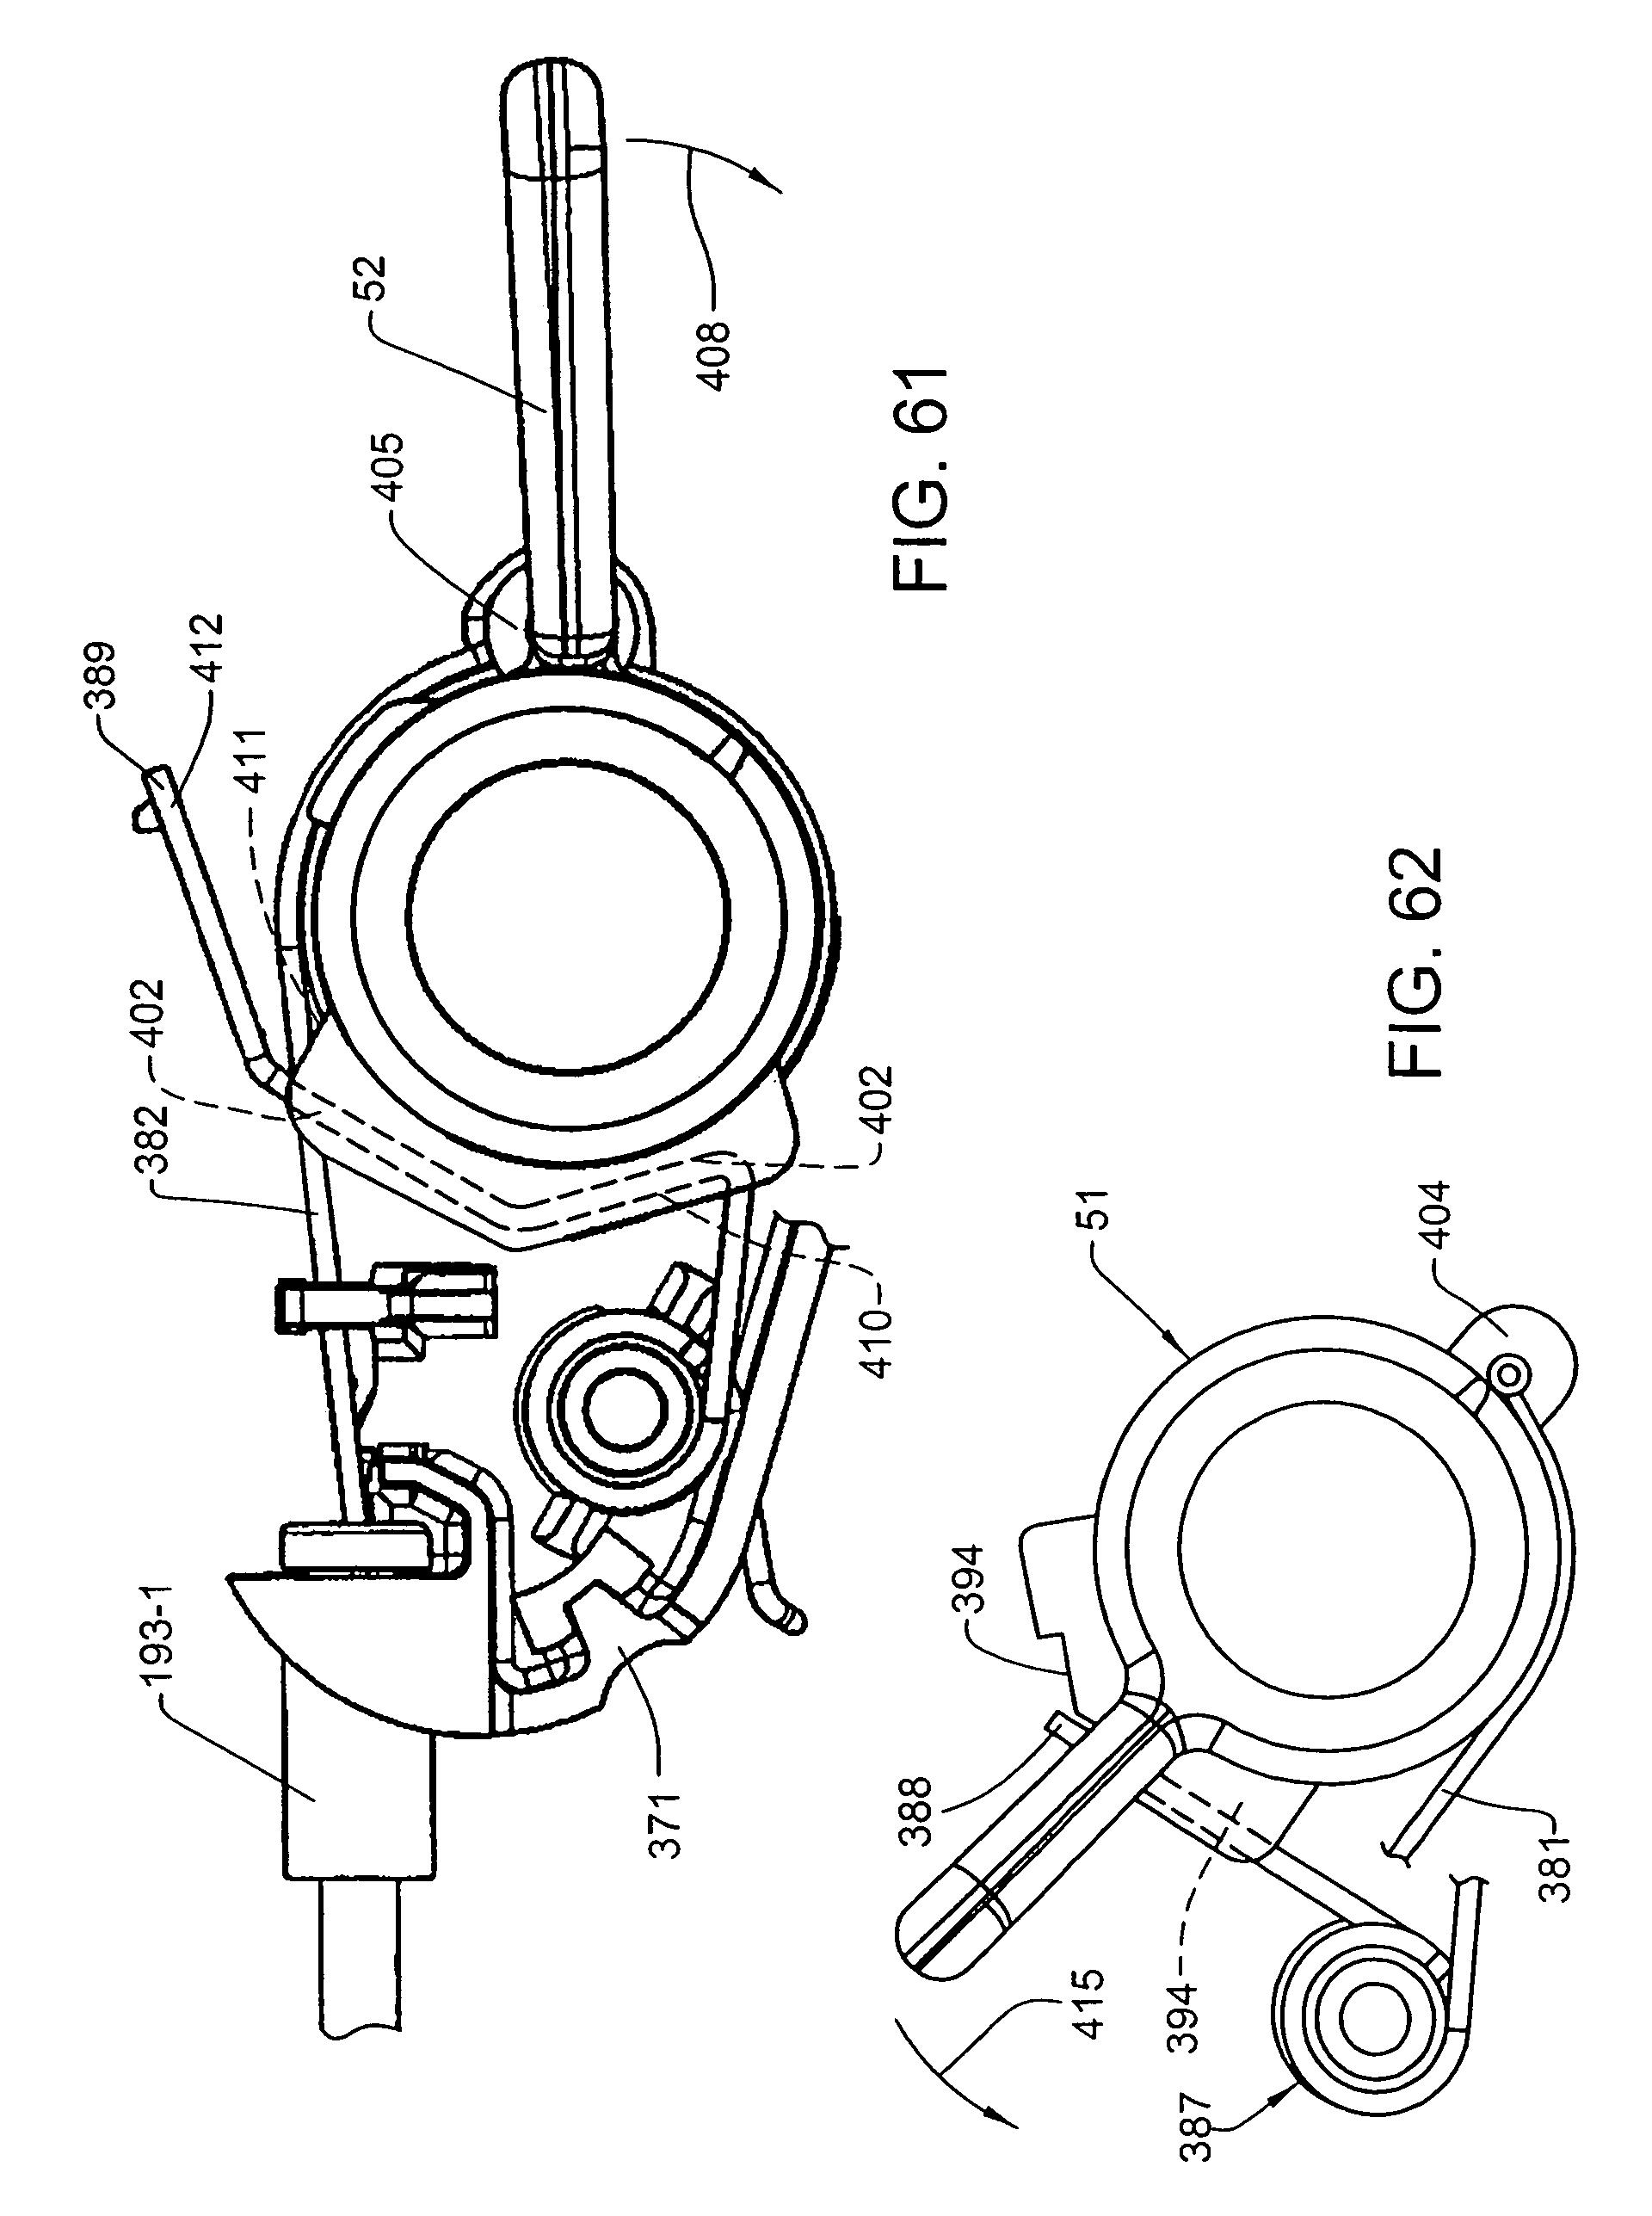 Patent Us7997652 Tilt Control Mechanism For A Chair Google Patents 98 Dodge Dakota Blower Wiring Diagram Drawing